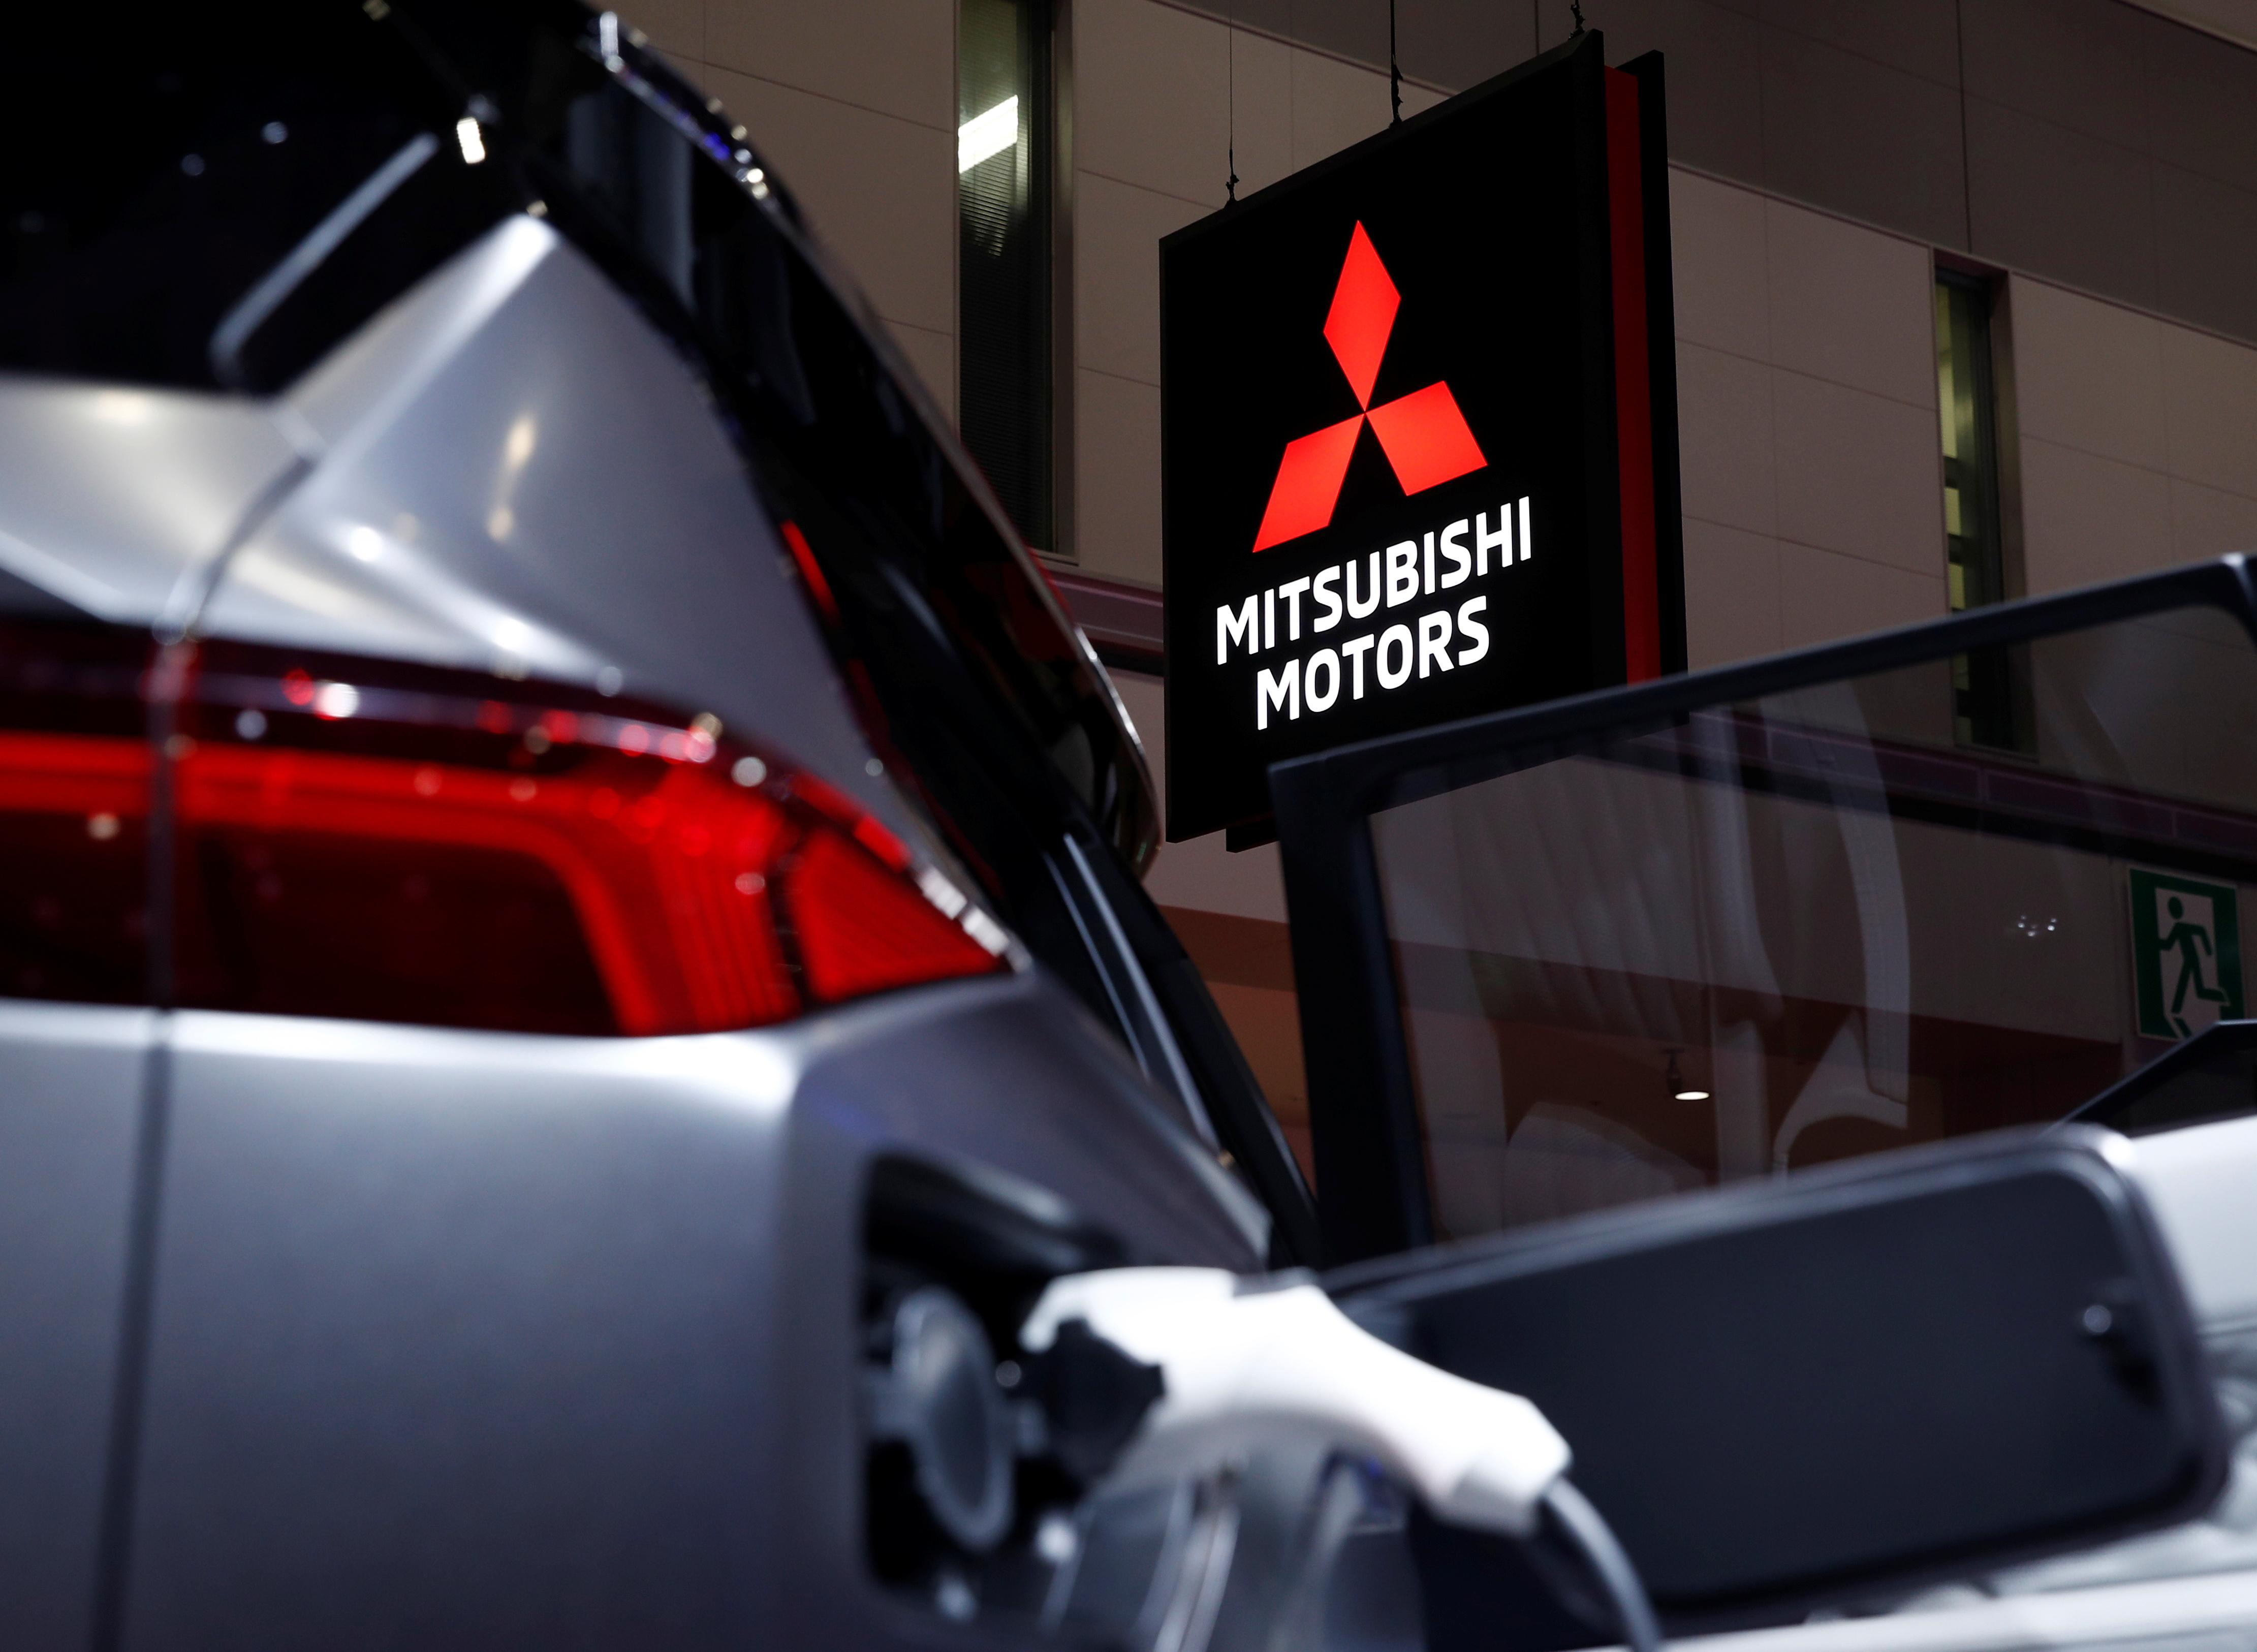 Mitsubishi Motors enlists Israeli startup as Japan plays catch up...